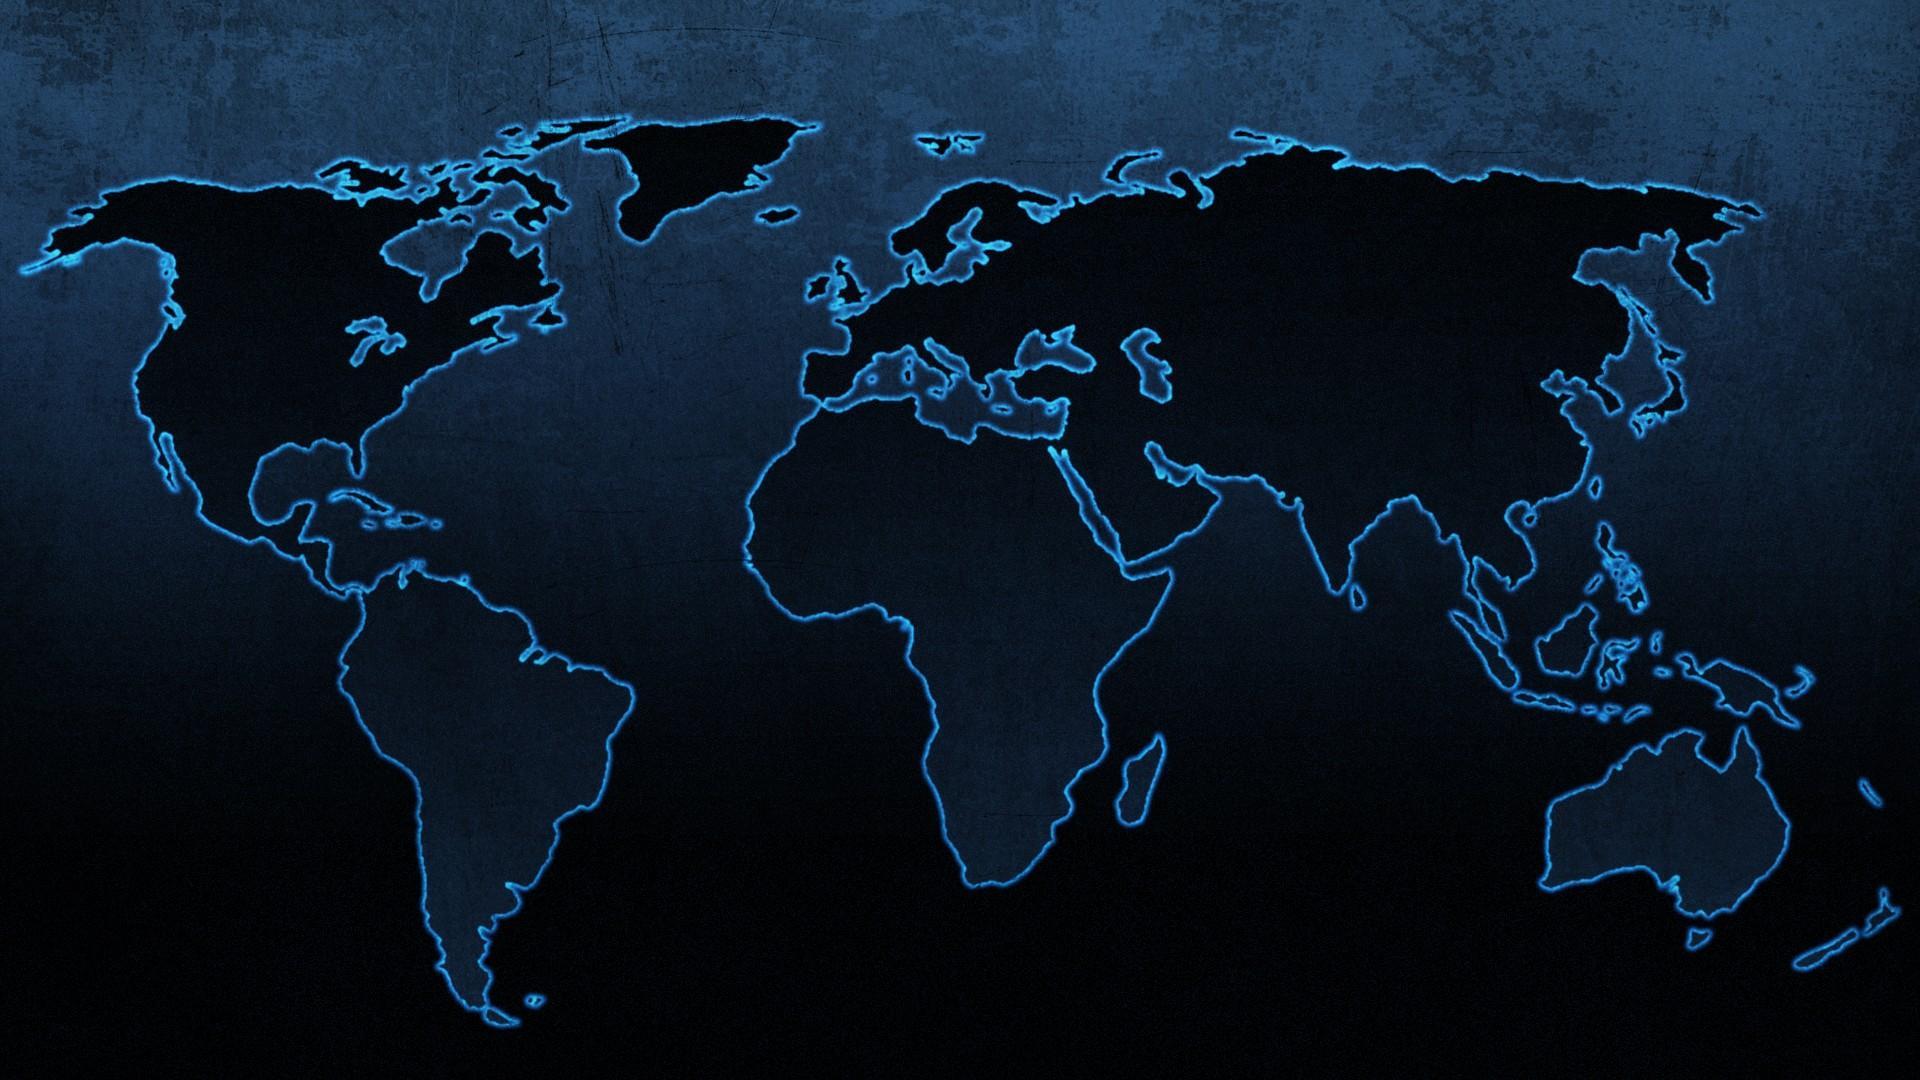 World map wallpaper uk wallpapersafari world map wallpapers blue continents maps world map wallpaper 1920x1080 gumiabroncs Choice Image